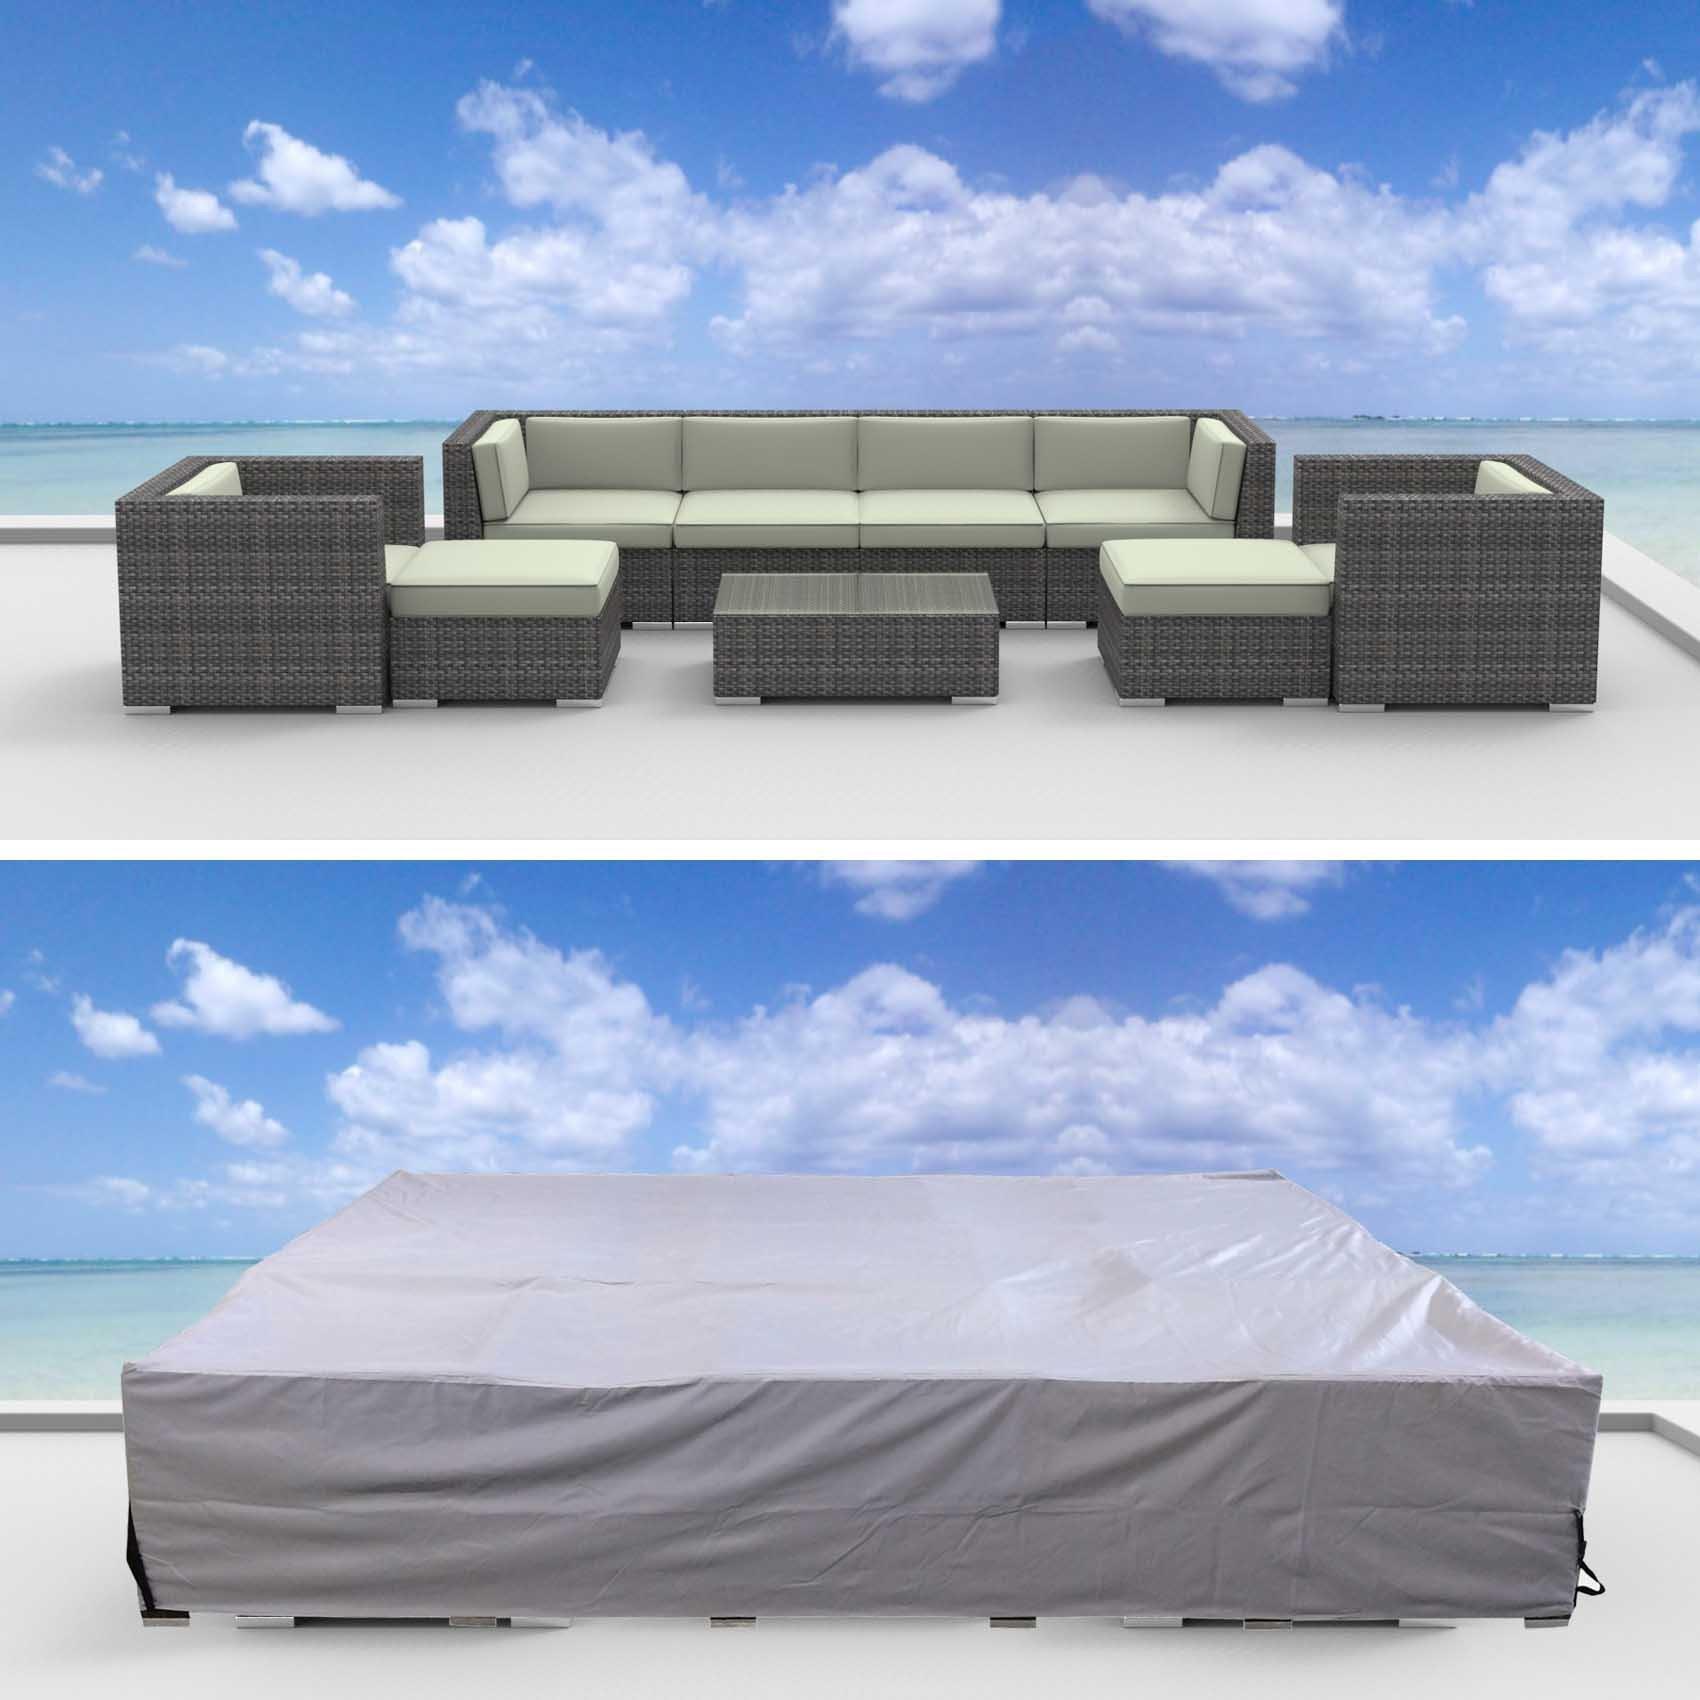 UrbanFurnishing Furniture-cover-L Outdoor Patio Furniture Cover